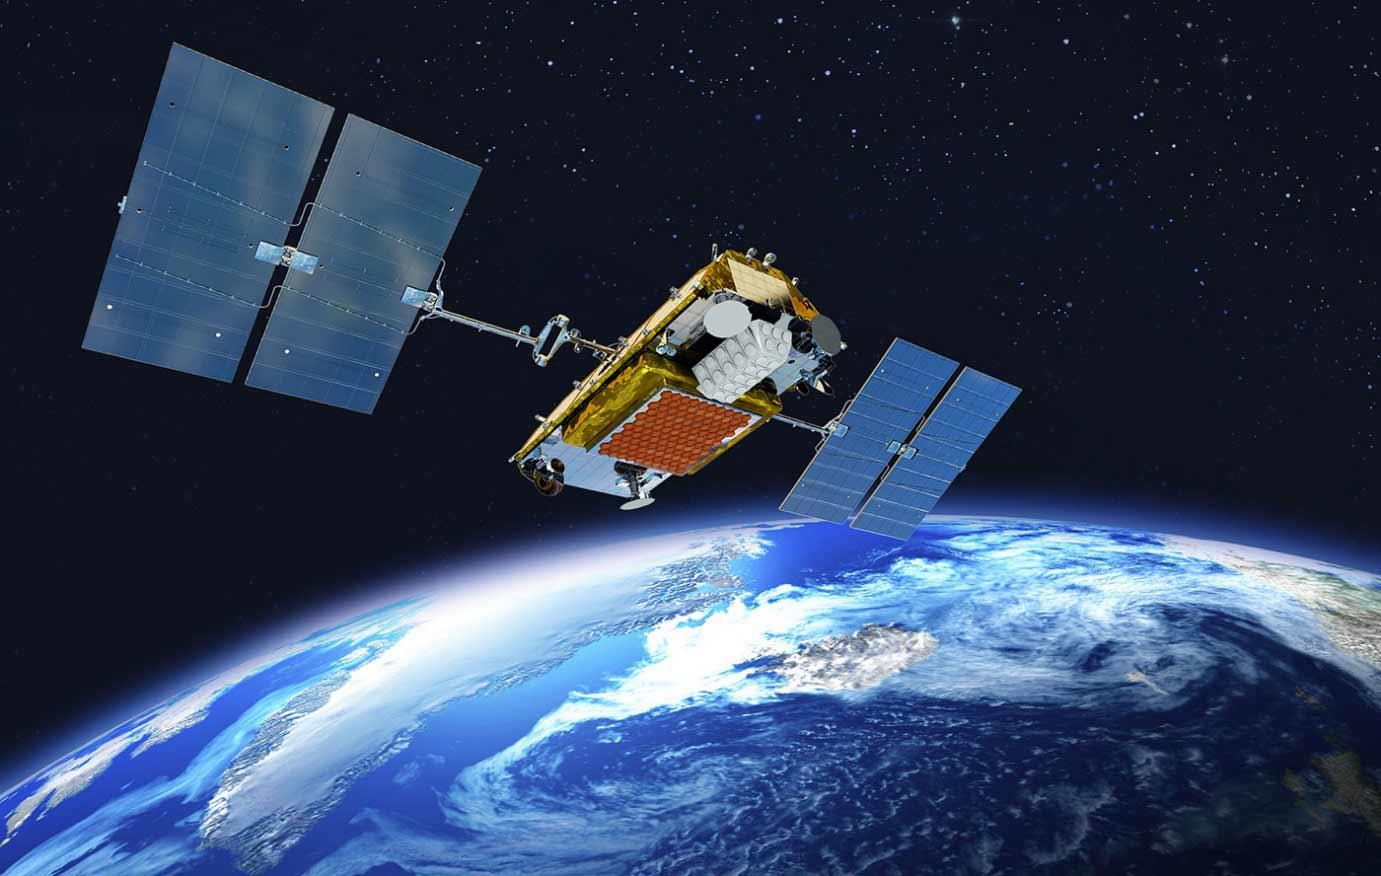 Iridium Communications successfully launched the first ten Iridium NEXT satellites